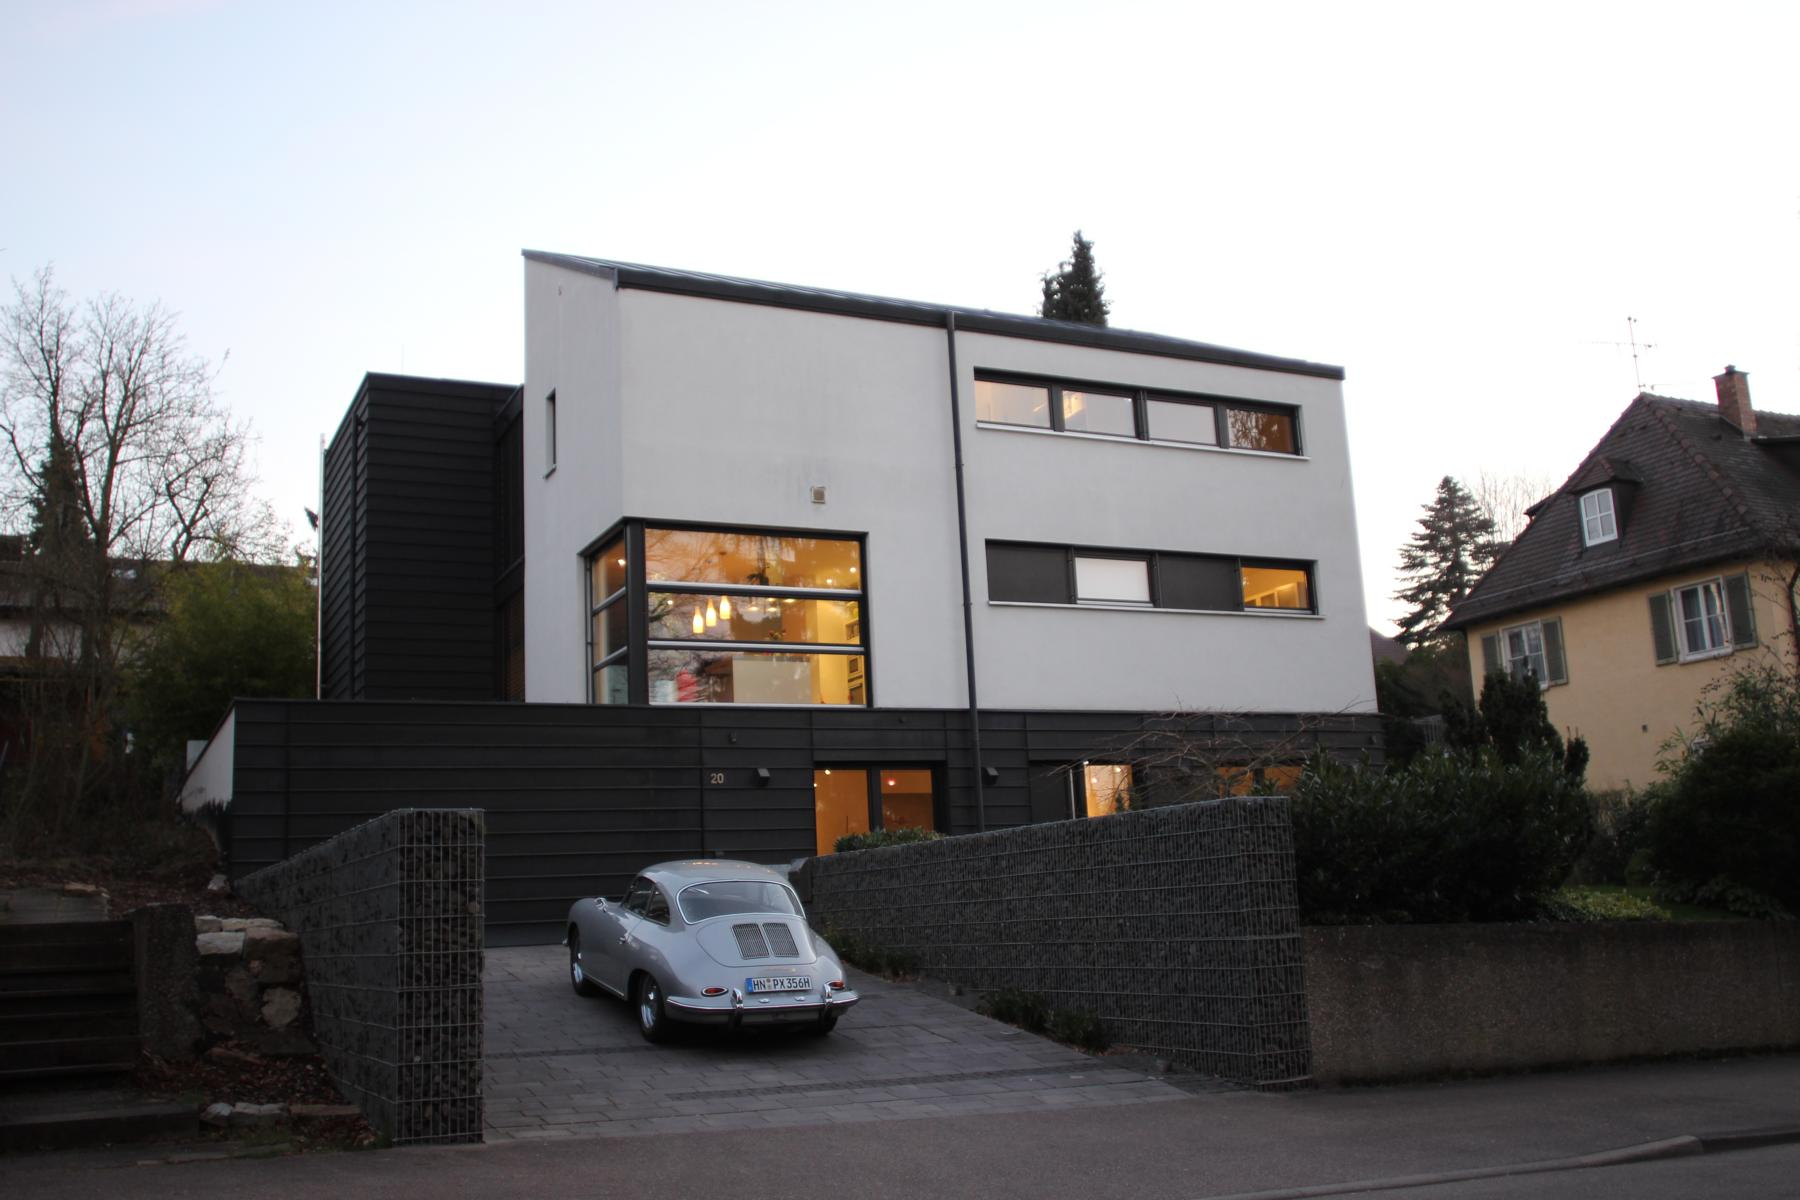 Architekt d rrwang moderne architektur im kreis heilbronn - Architekten kreis ludwigsburg ...